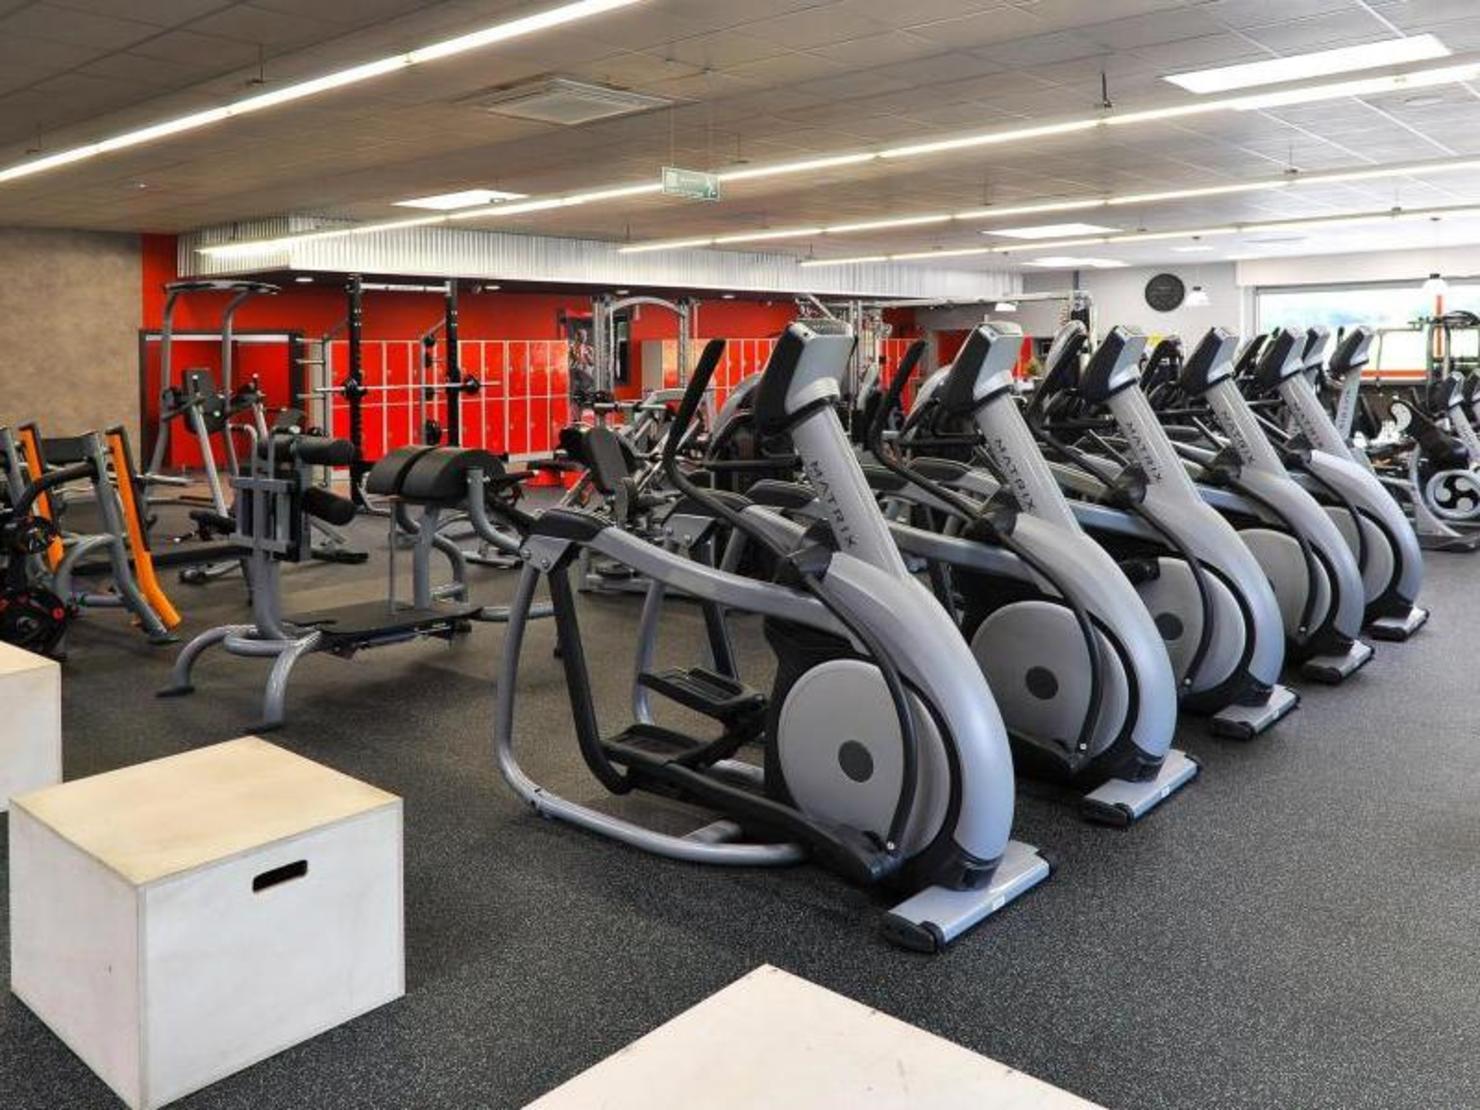 Salle De Sport Flaxlanden gfc sierentz   tarifs, avis, horaires, essai gratuit